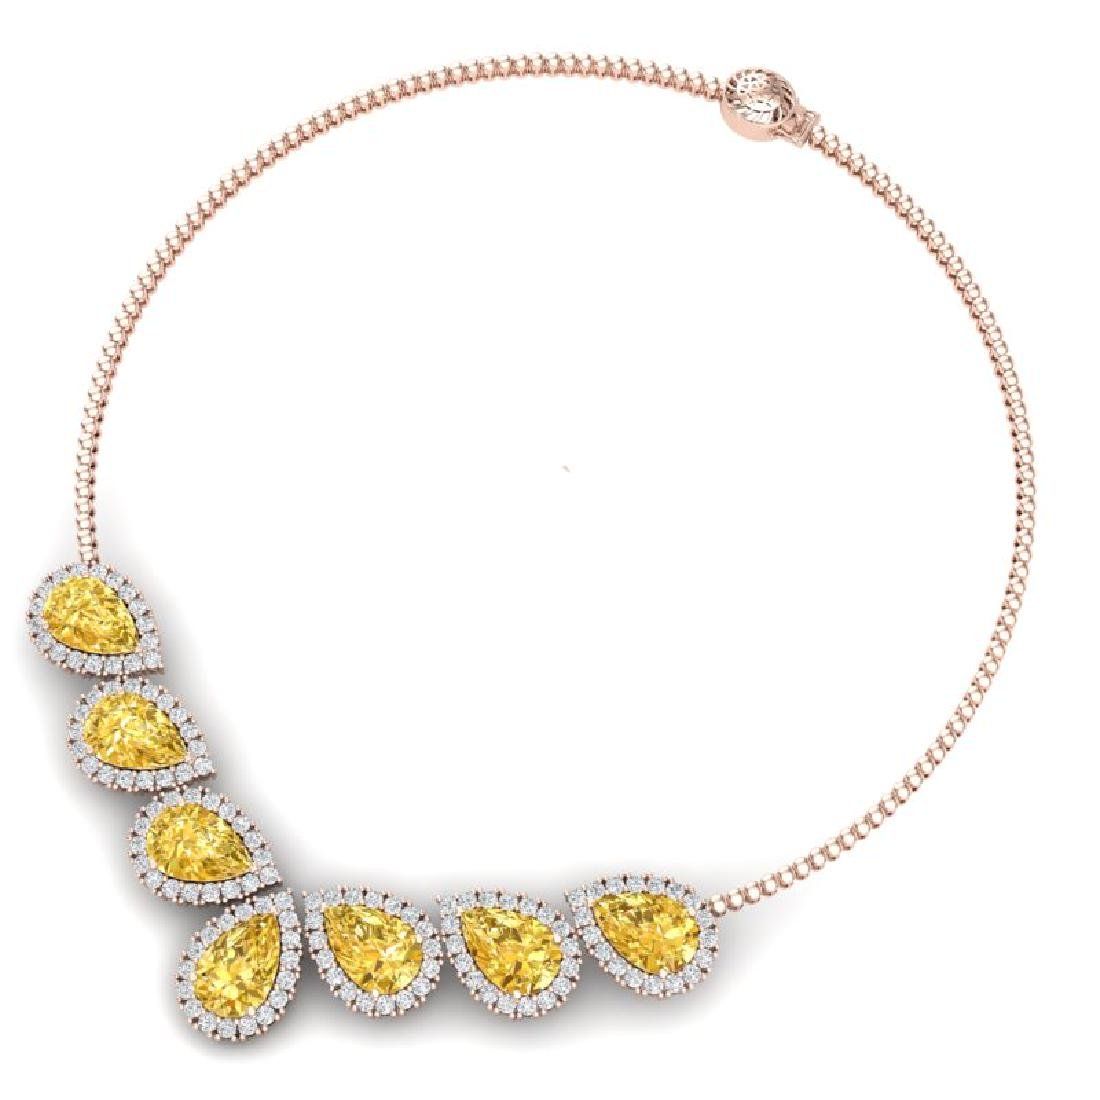 33.34 CTW Royalty Canary Citrine & VS Diamond Necklace - 3